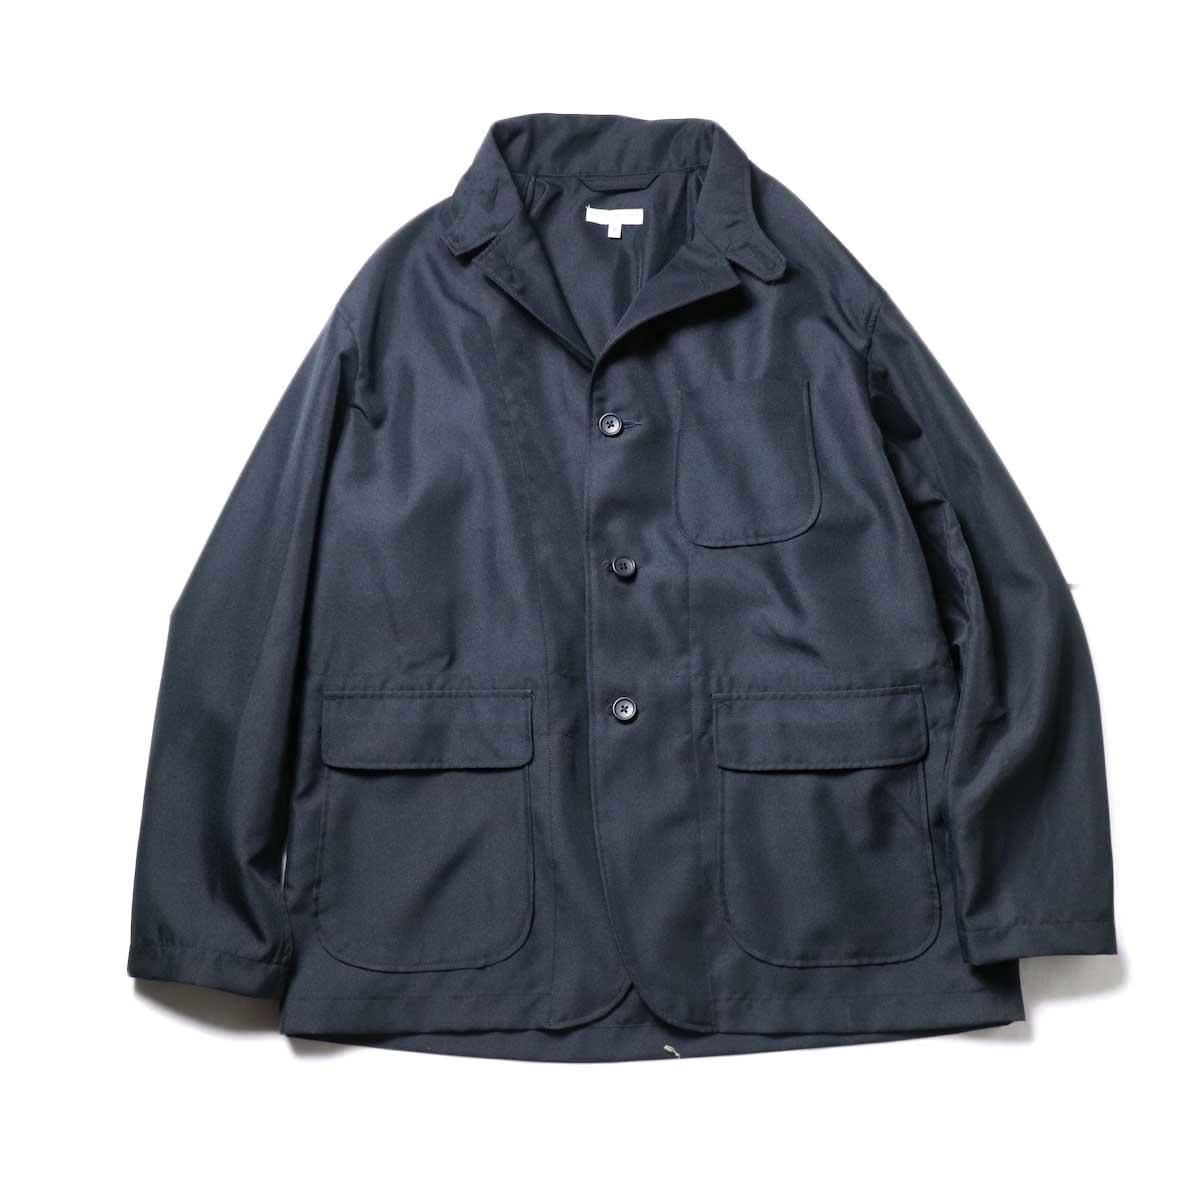 Engineered Garments / Loiter Jacket -Polyester Twill (Black)